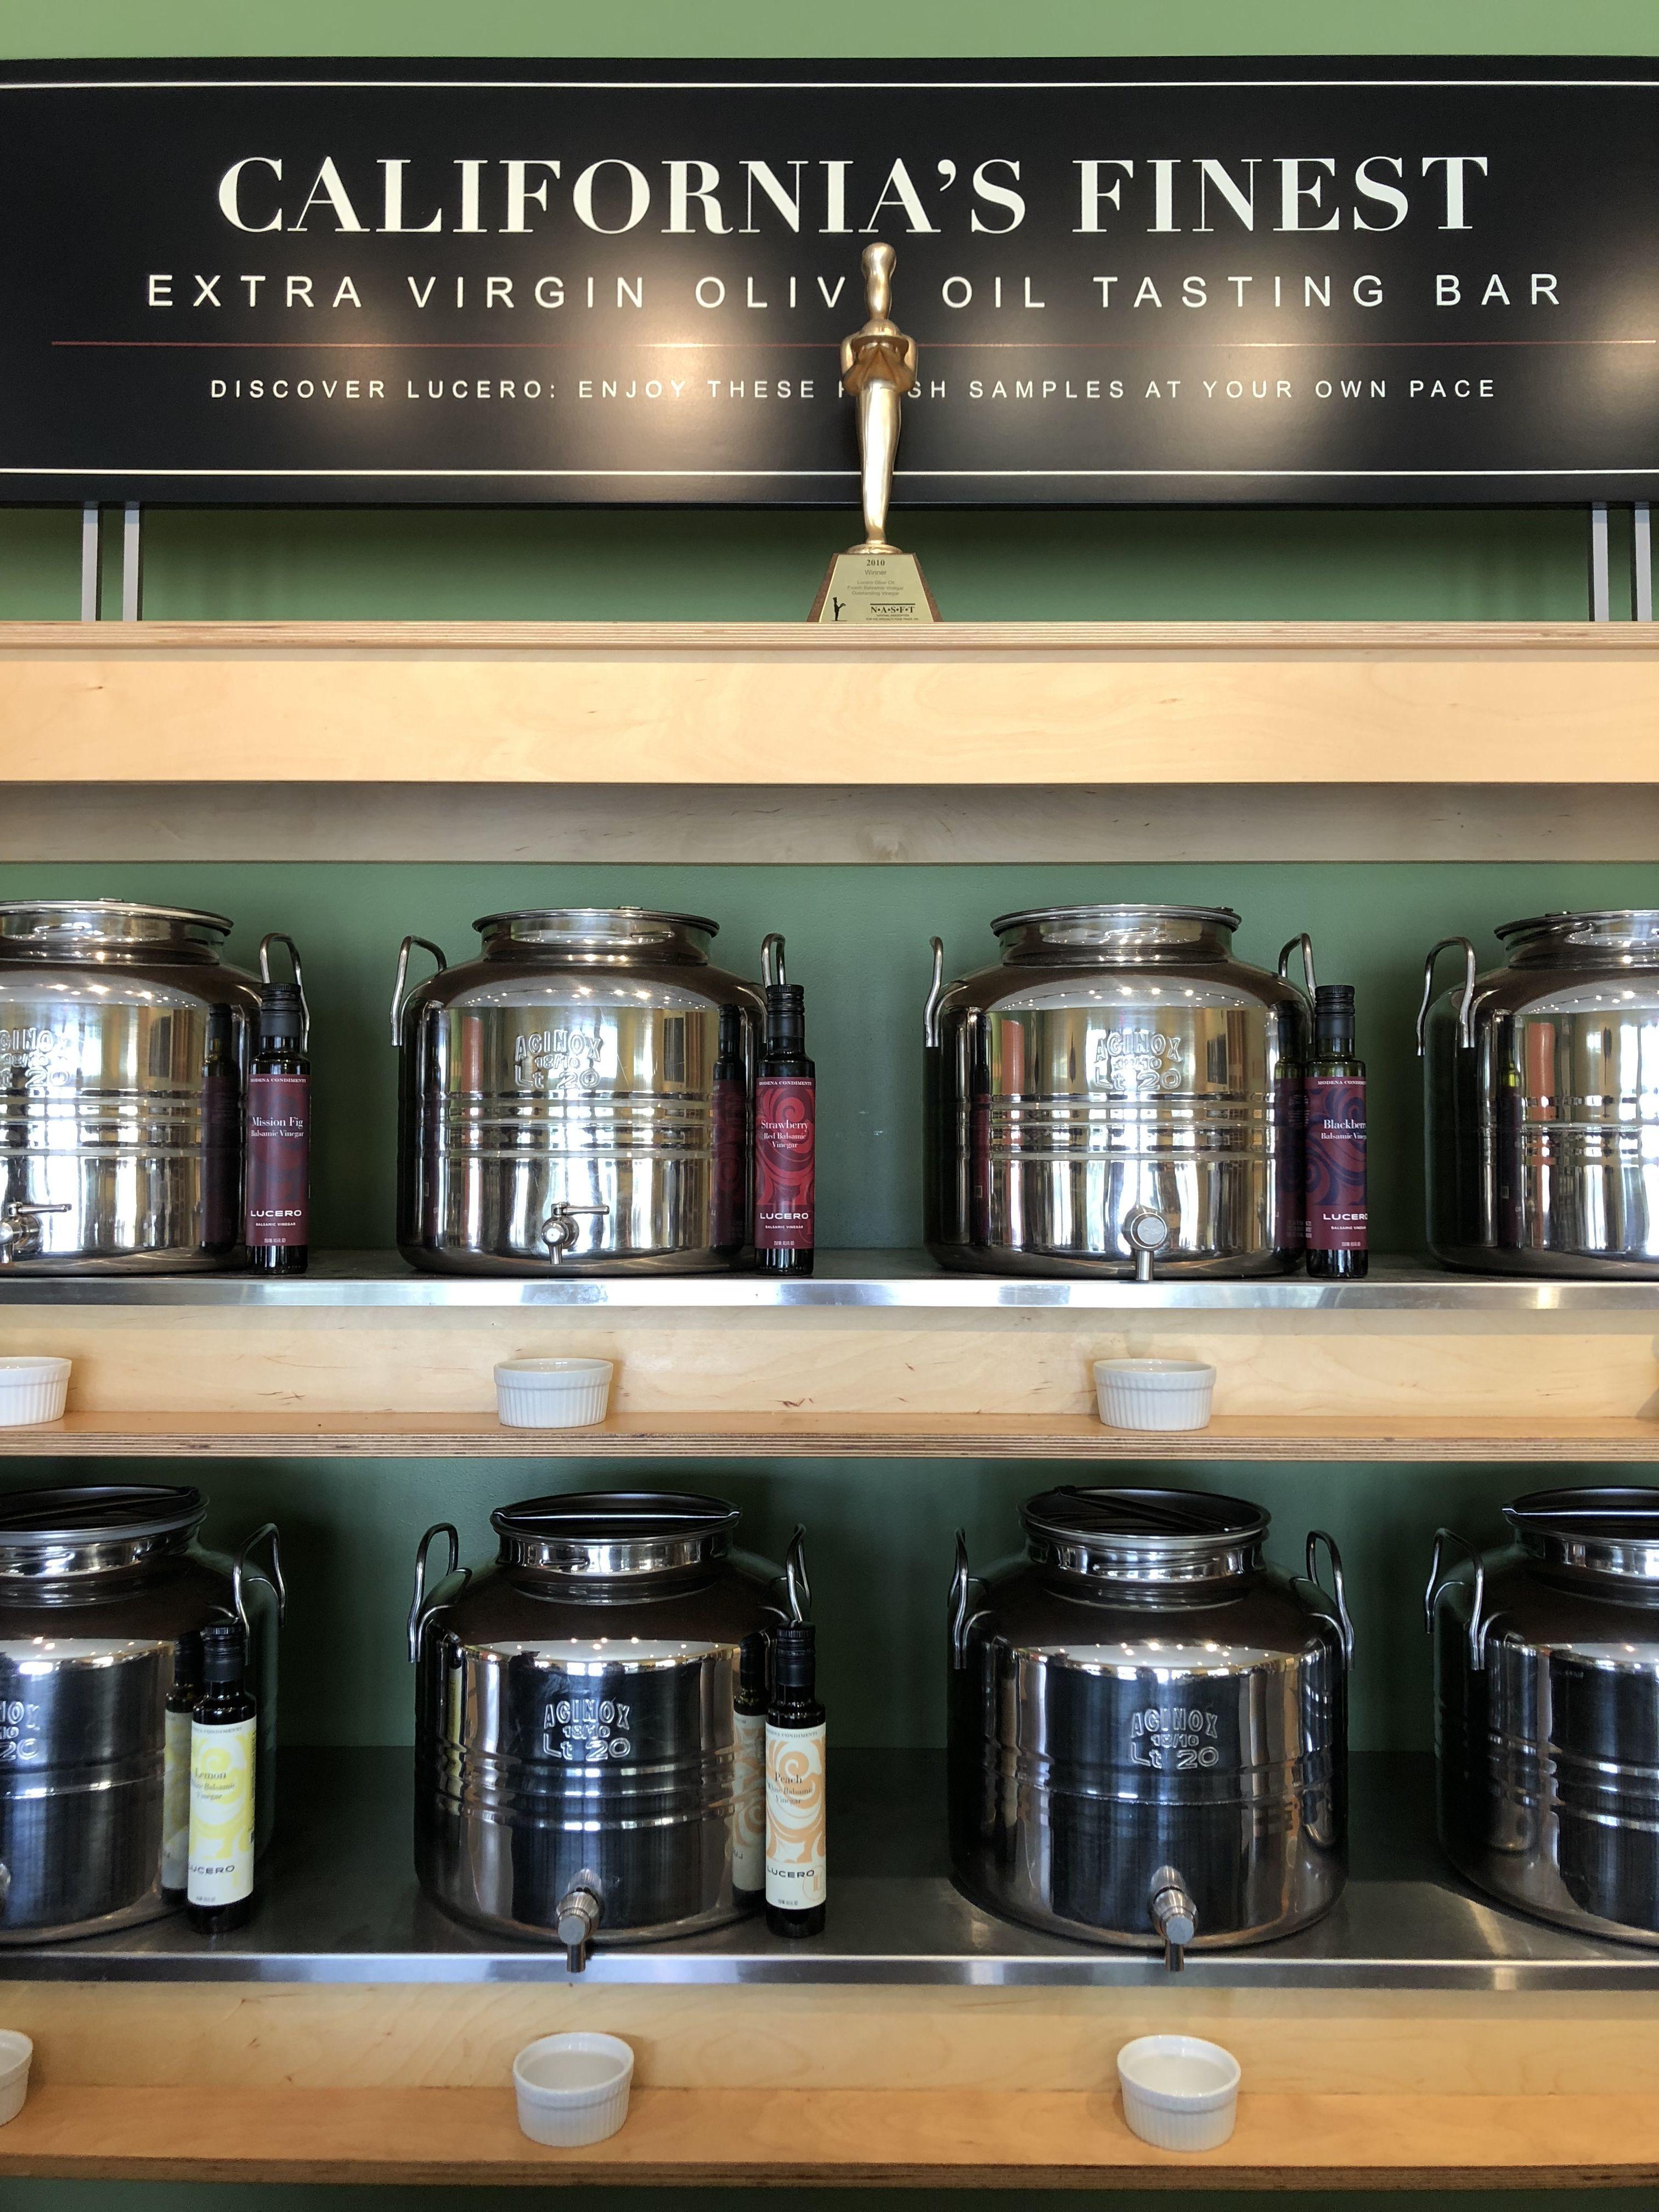 Lucerno-Olive-Oil-Tastin-Maya-Stanton.JPG?mtime=20181206211951#asset:103974